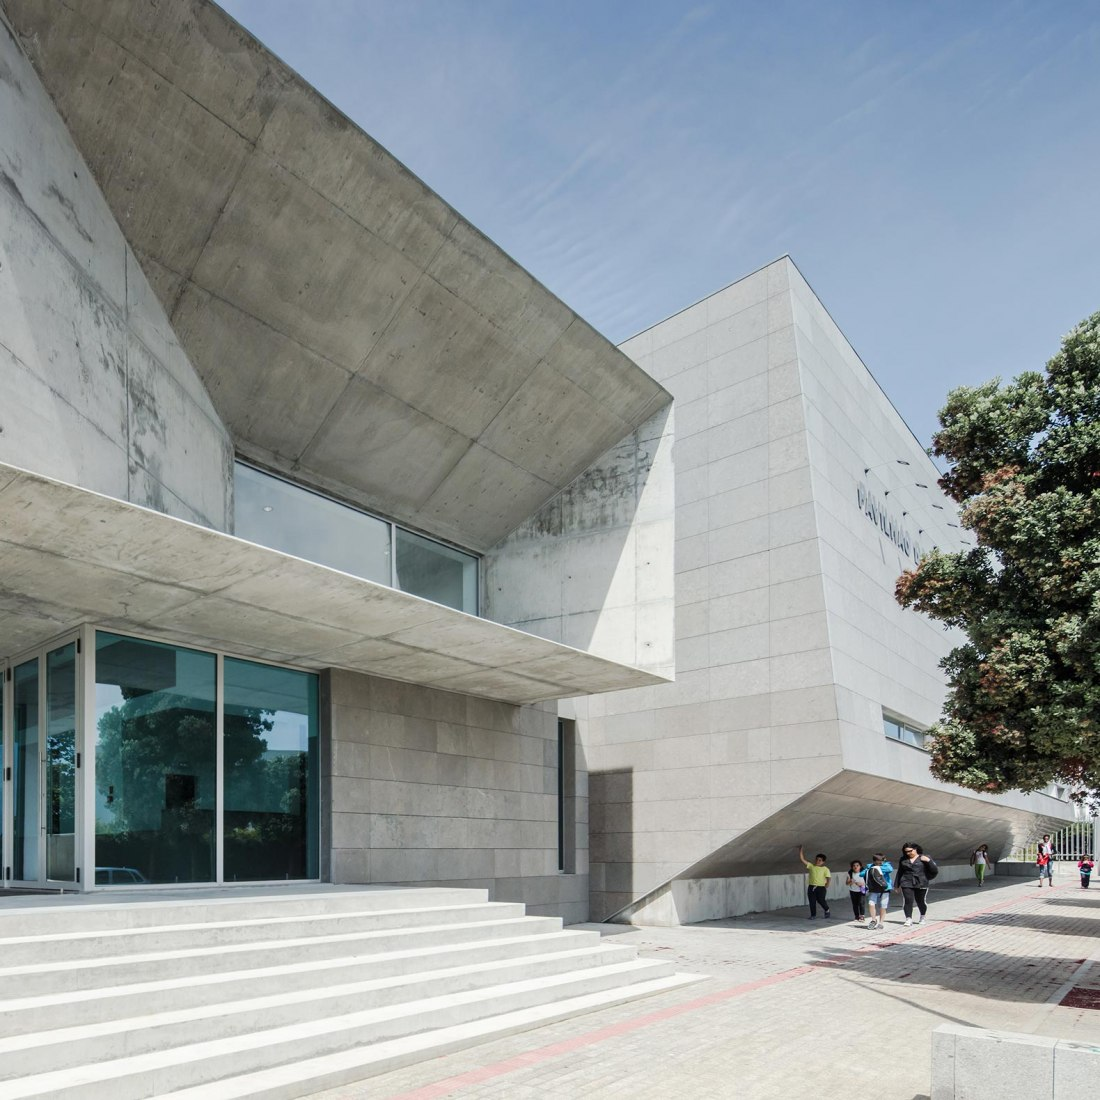 Pavilhão do Atlântico por Valdemar Coutinho Arquitectos. Fotografía por Joao Morgado